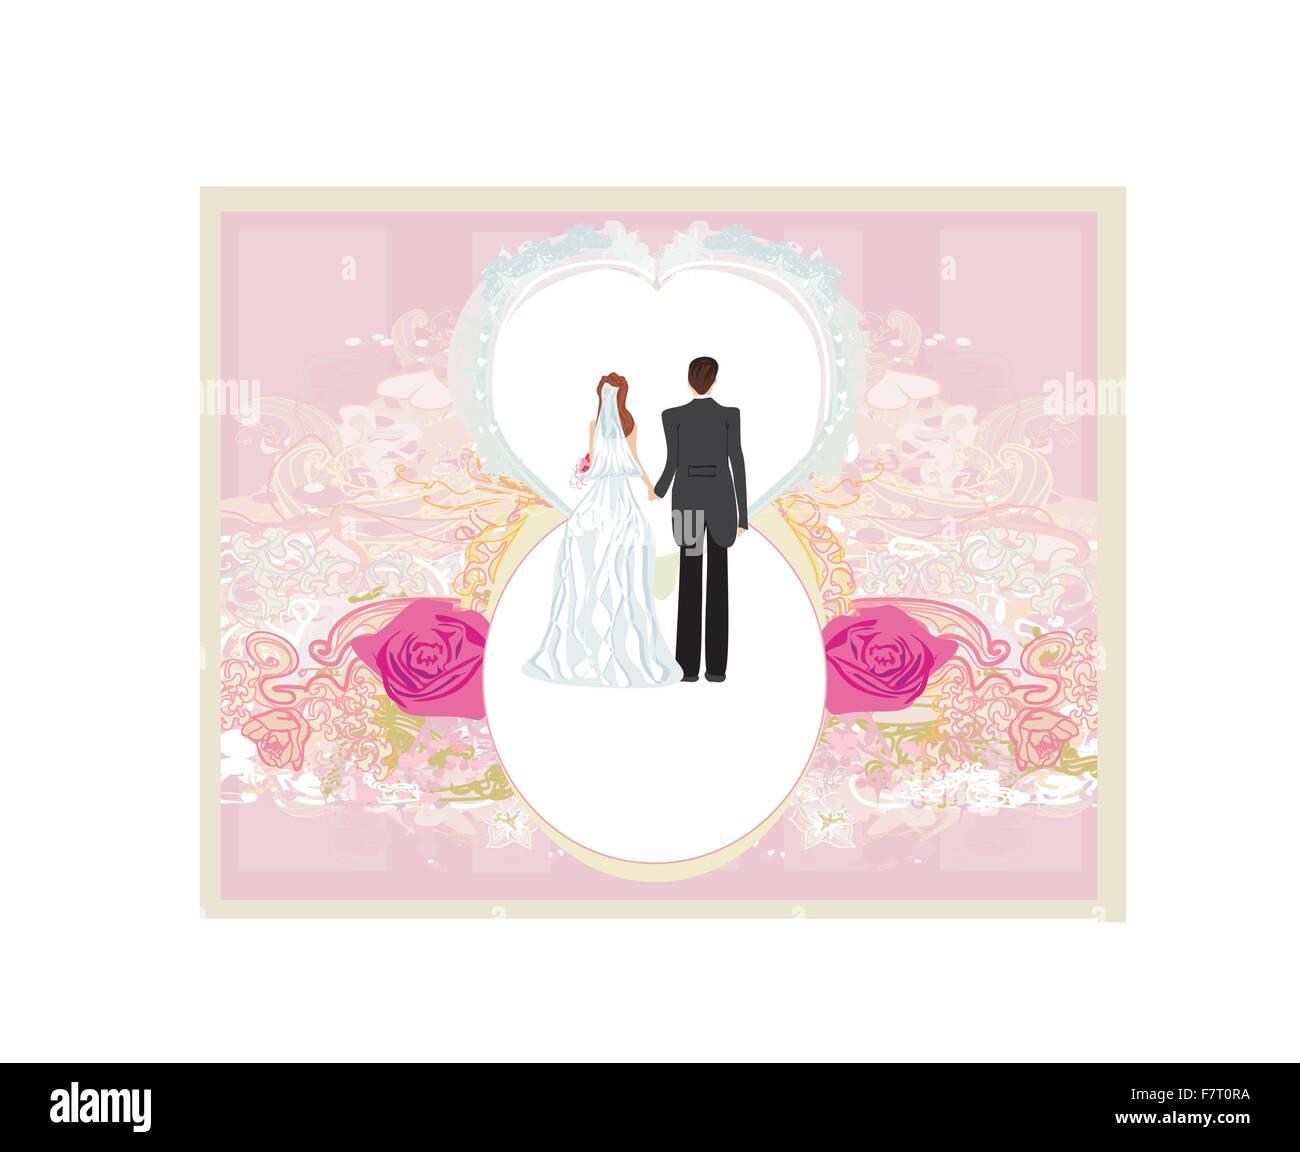 wedding invitation card with a cute couple Stock Vector Art ...